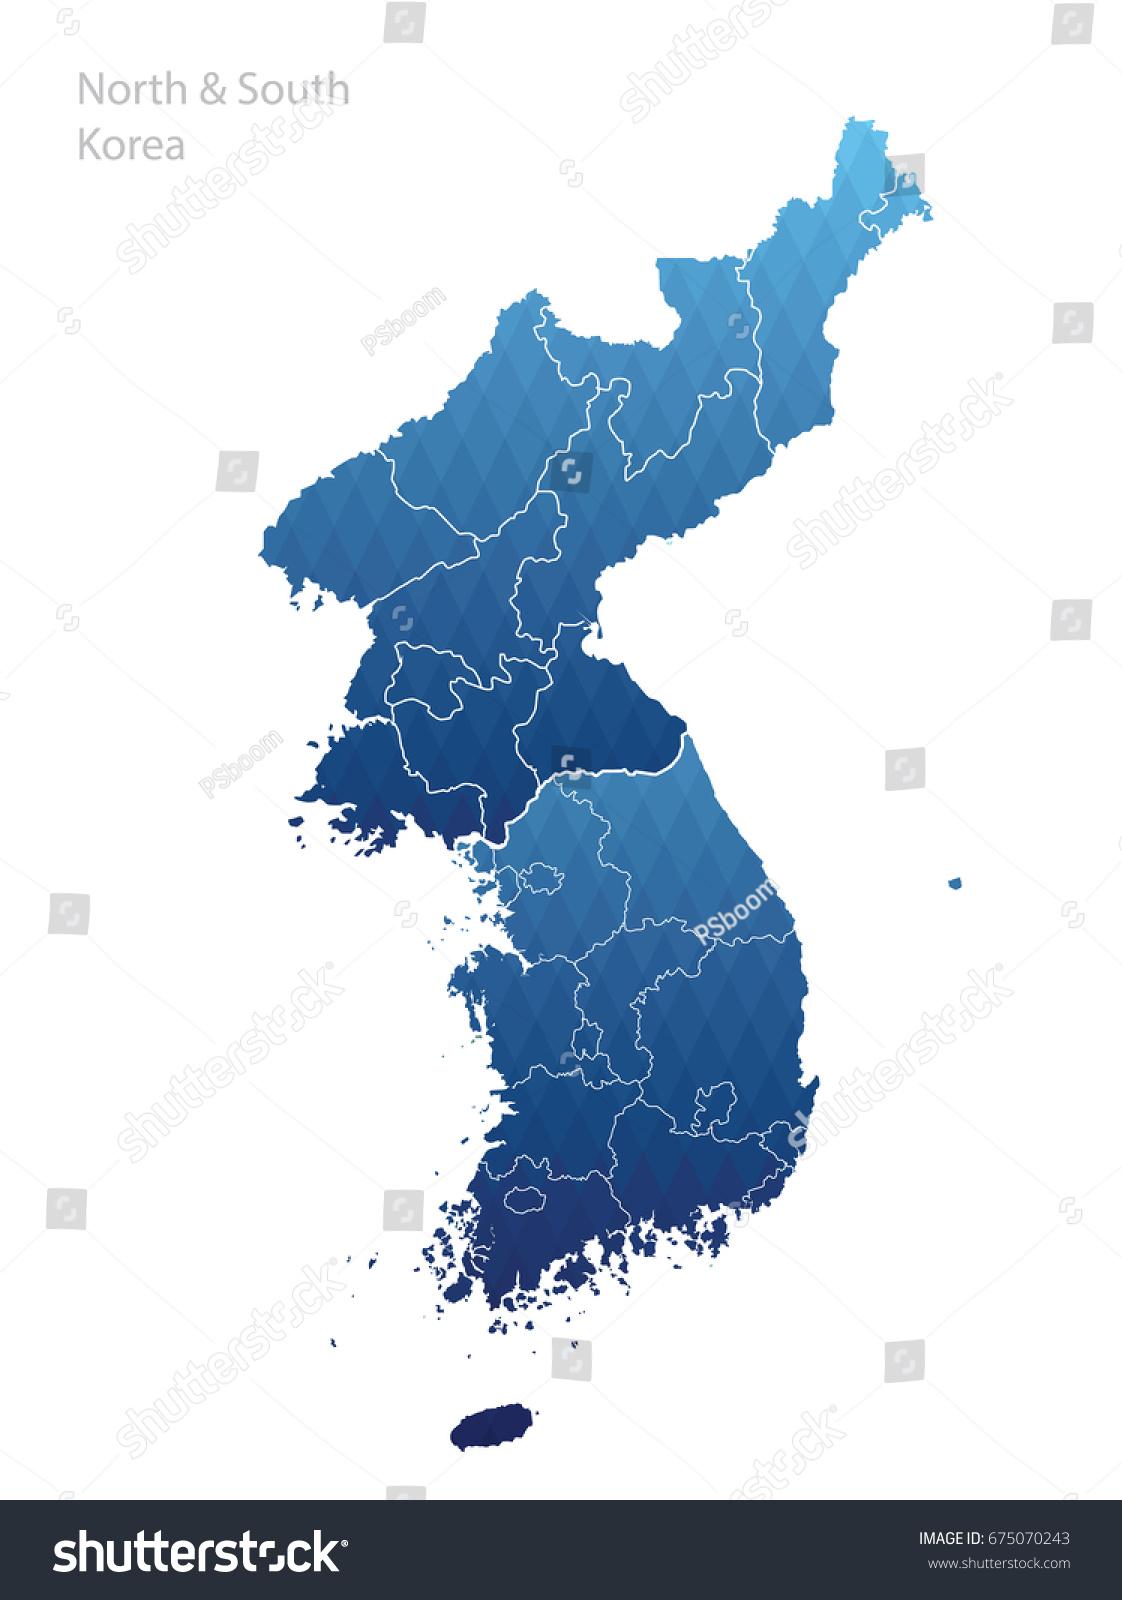 outline japan modernization Regional outline for east asia 8000 - 600 ce 600 - 1450 ce 1450-1750 ce 1750 - 1914 ce 1914 - present  industrialized in japan modernization of japan, taiwan.